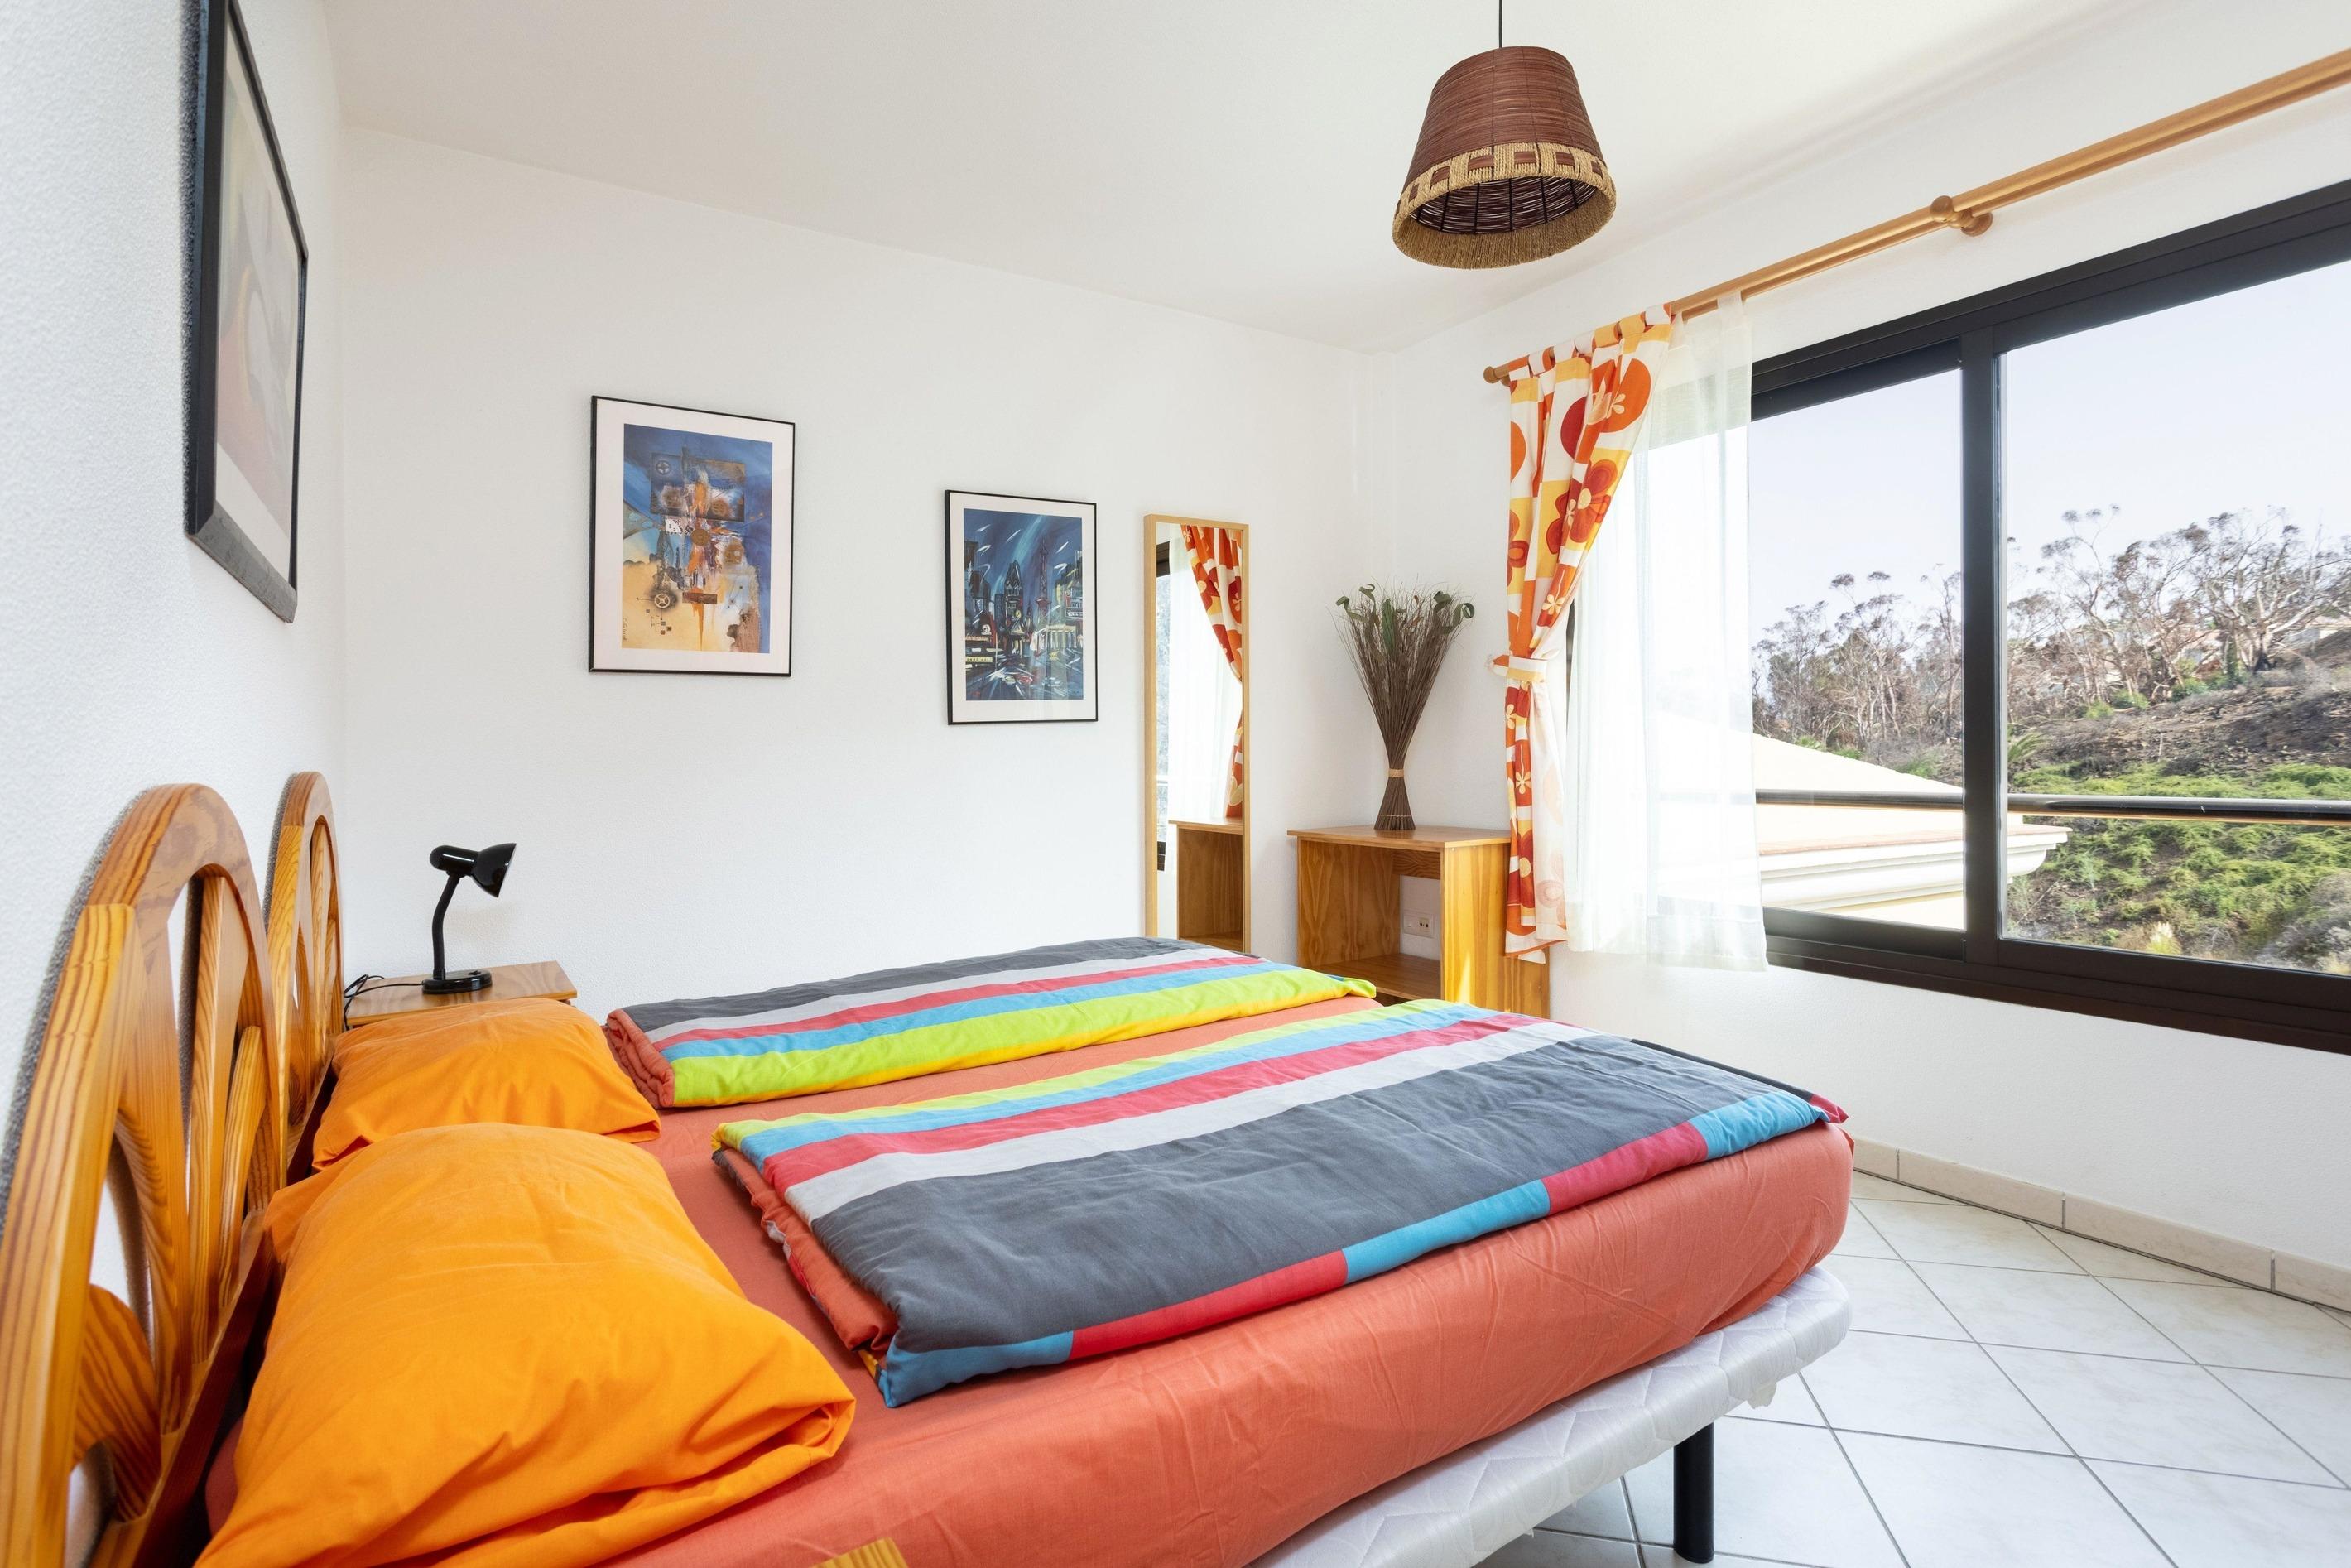 Appartement de vacances Fewo Atico Florasol, sehr ruhig direkt am Naturschutzgebiet, mit Pool, 2 Terrassen, Grill, (2492983), Santa Ursula, Ténérife, Iles Canaries, Espagne, image 8